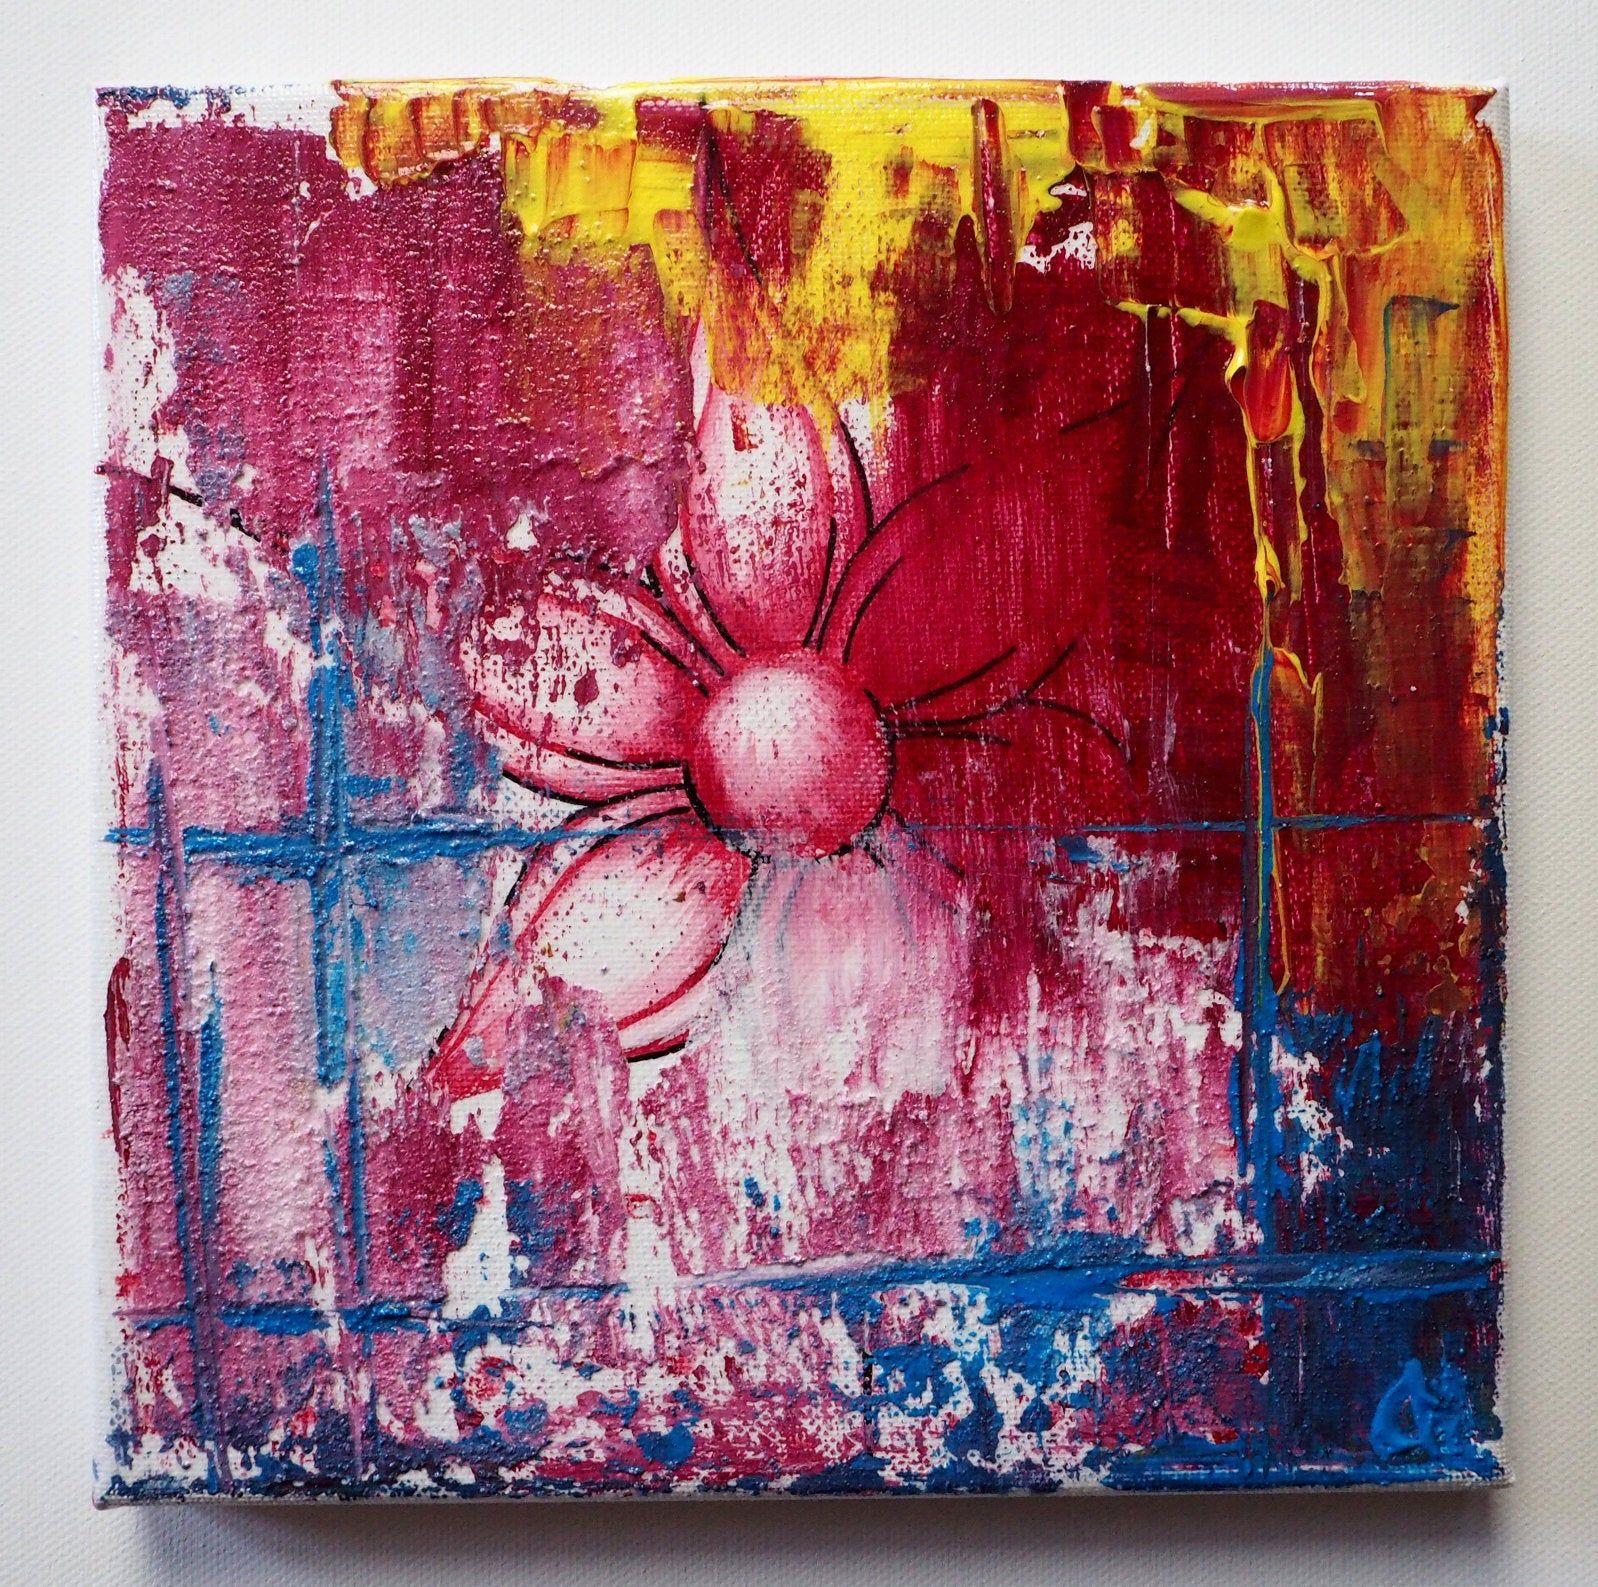 original abstraktes bild blume gemalde 20x20 cm wandbild etsy abstrakte bilder abstrakt moderne kunst berge malerei shop